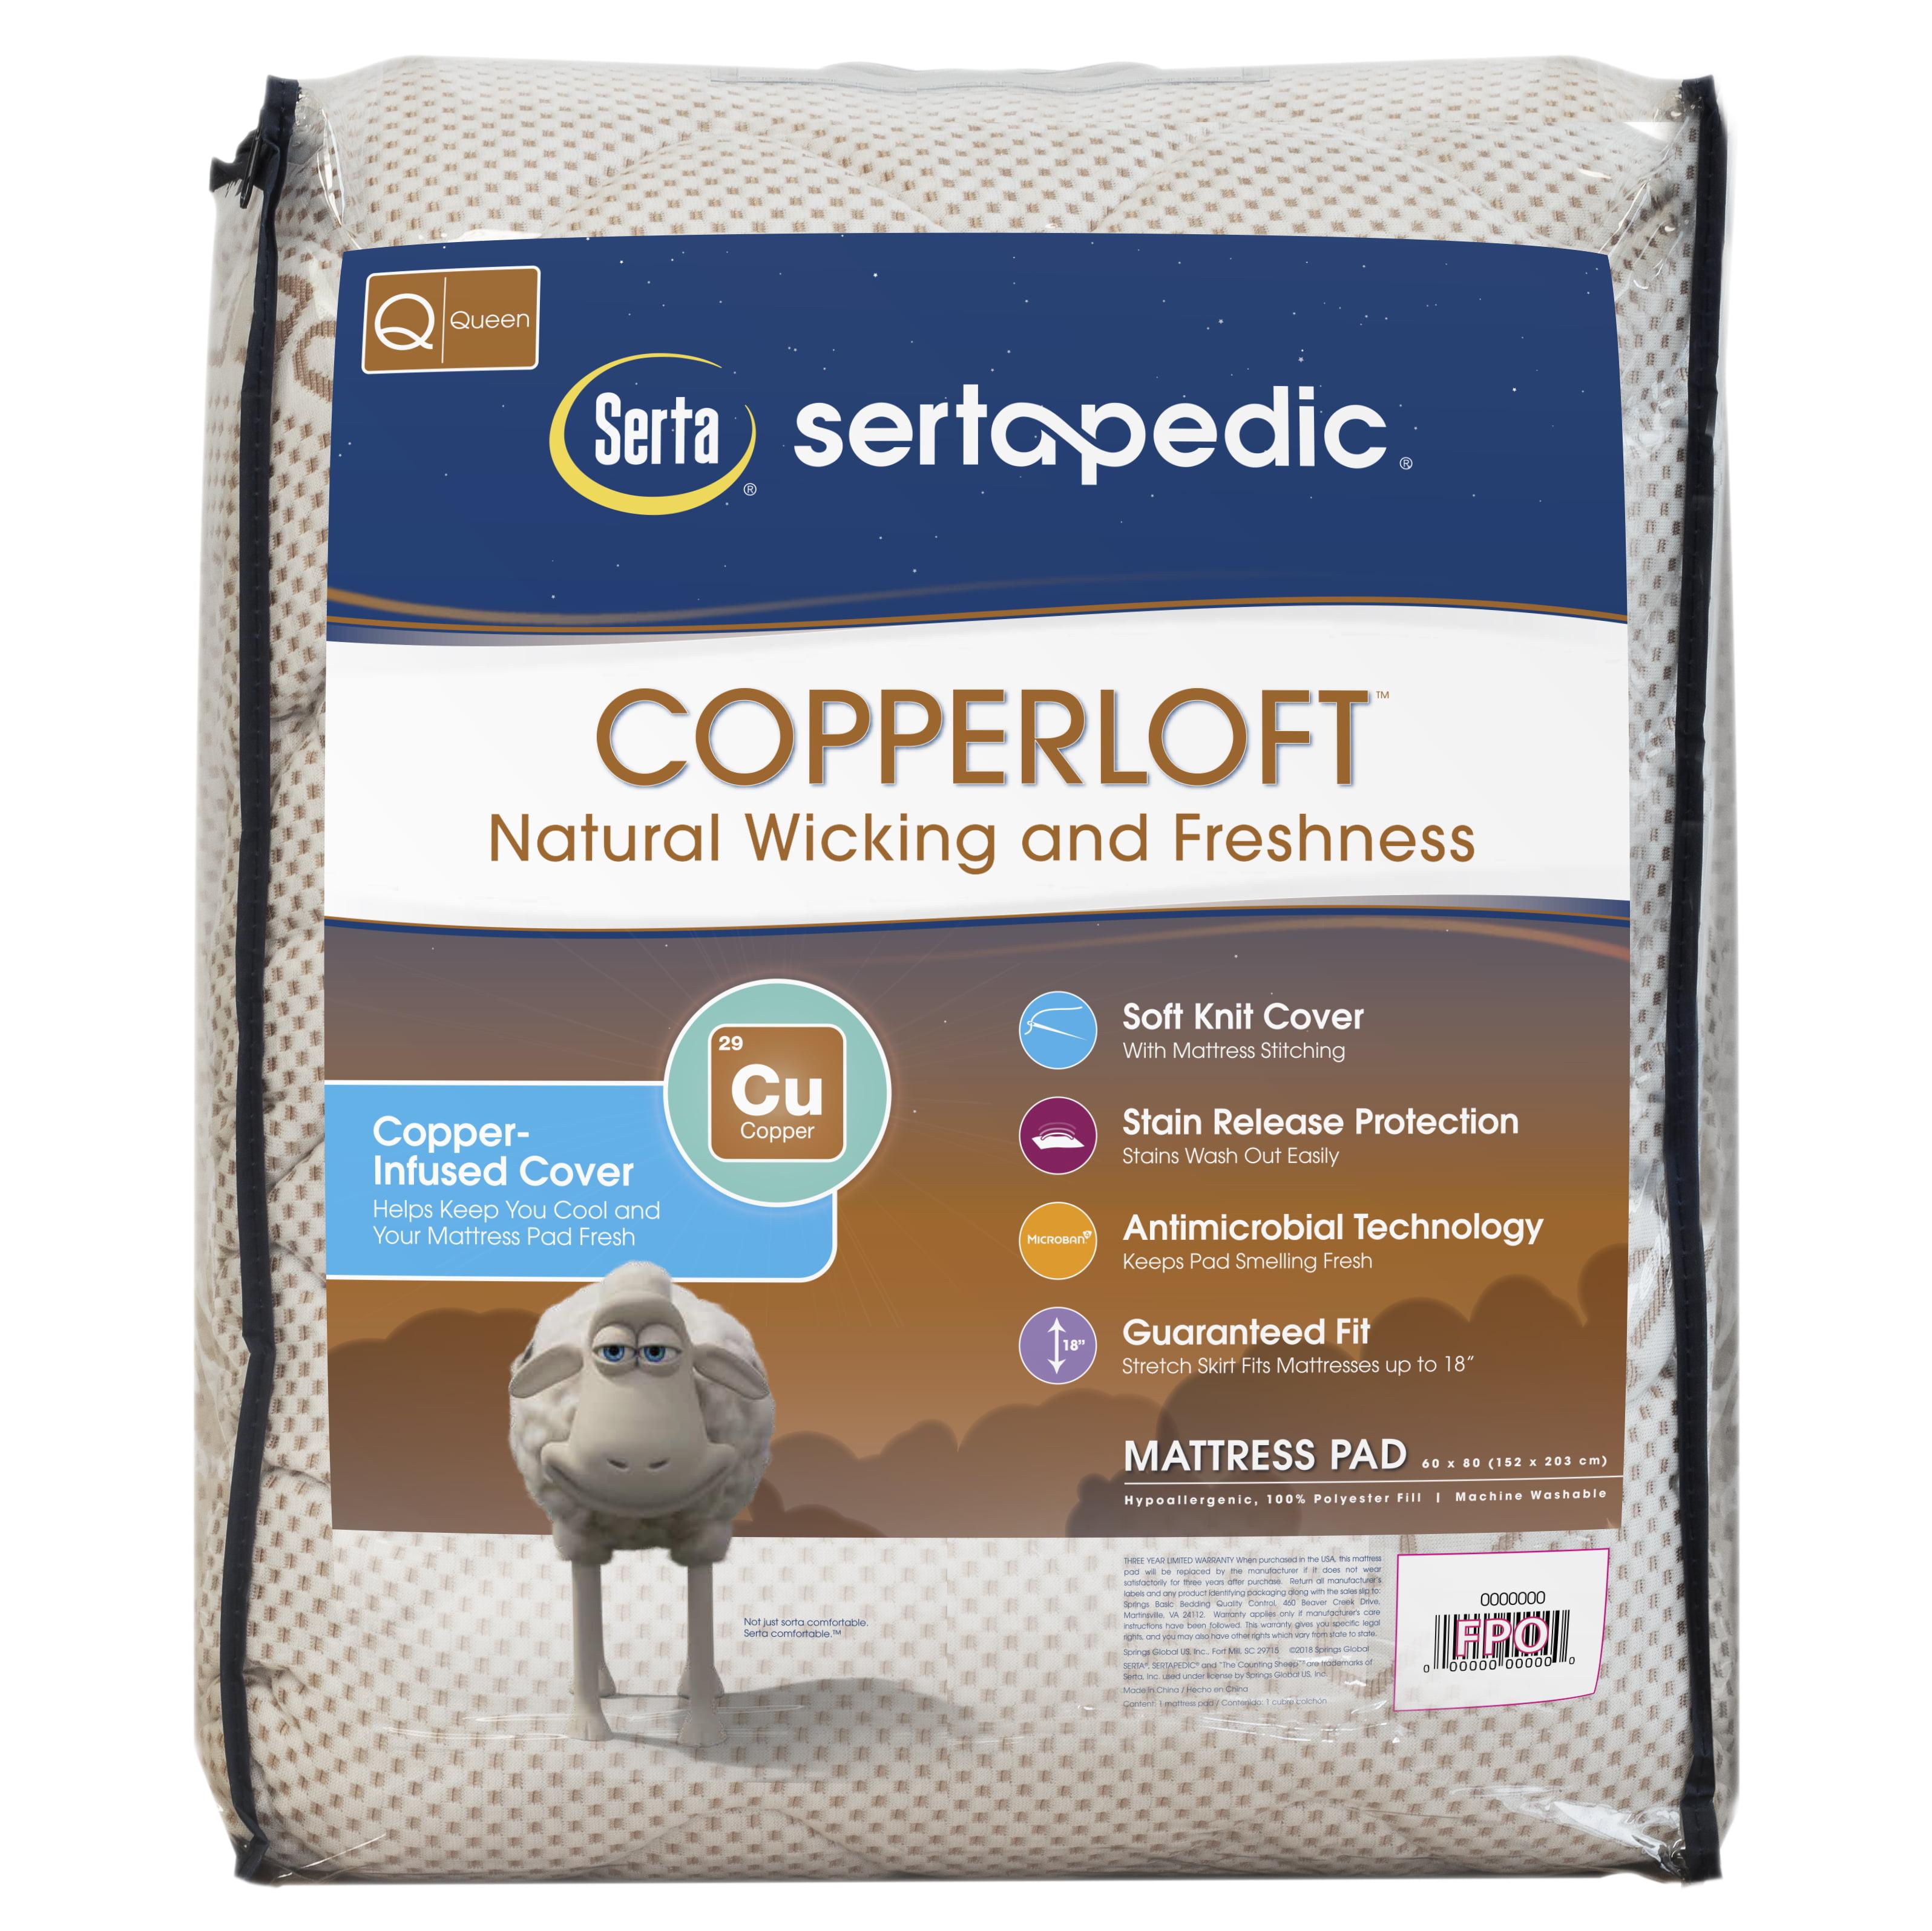 Sertapedic Copper Loft Mattress Pad by Serta, Queen